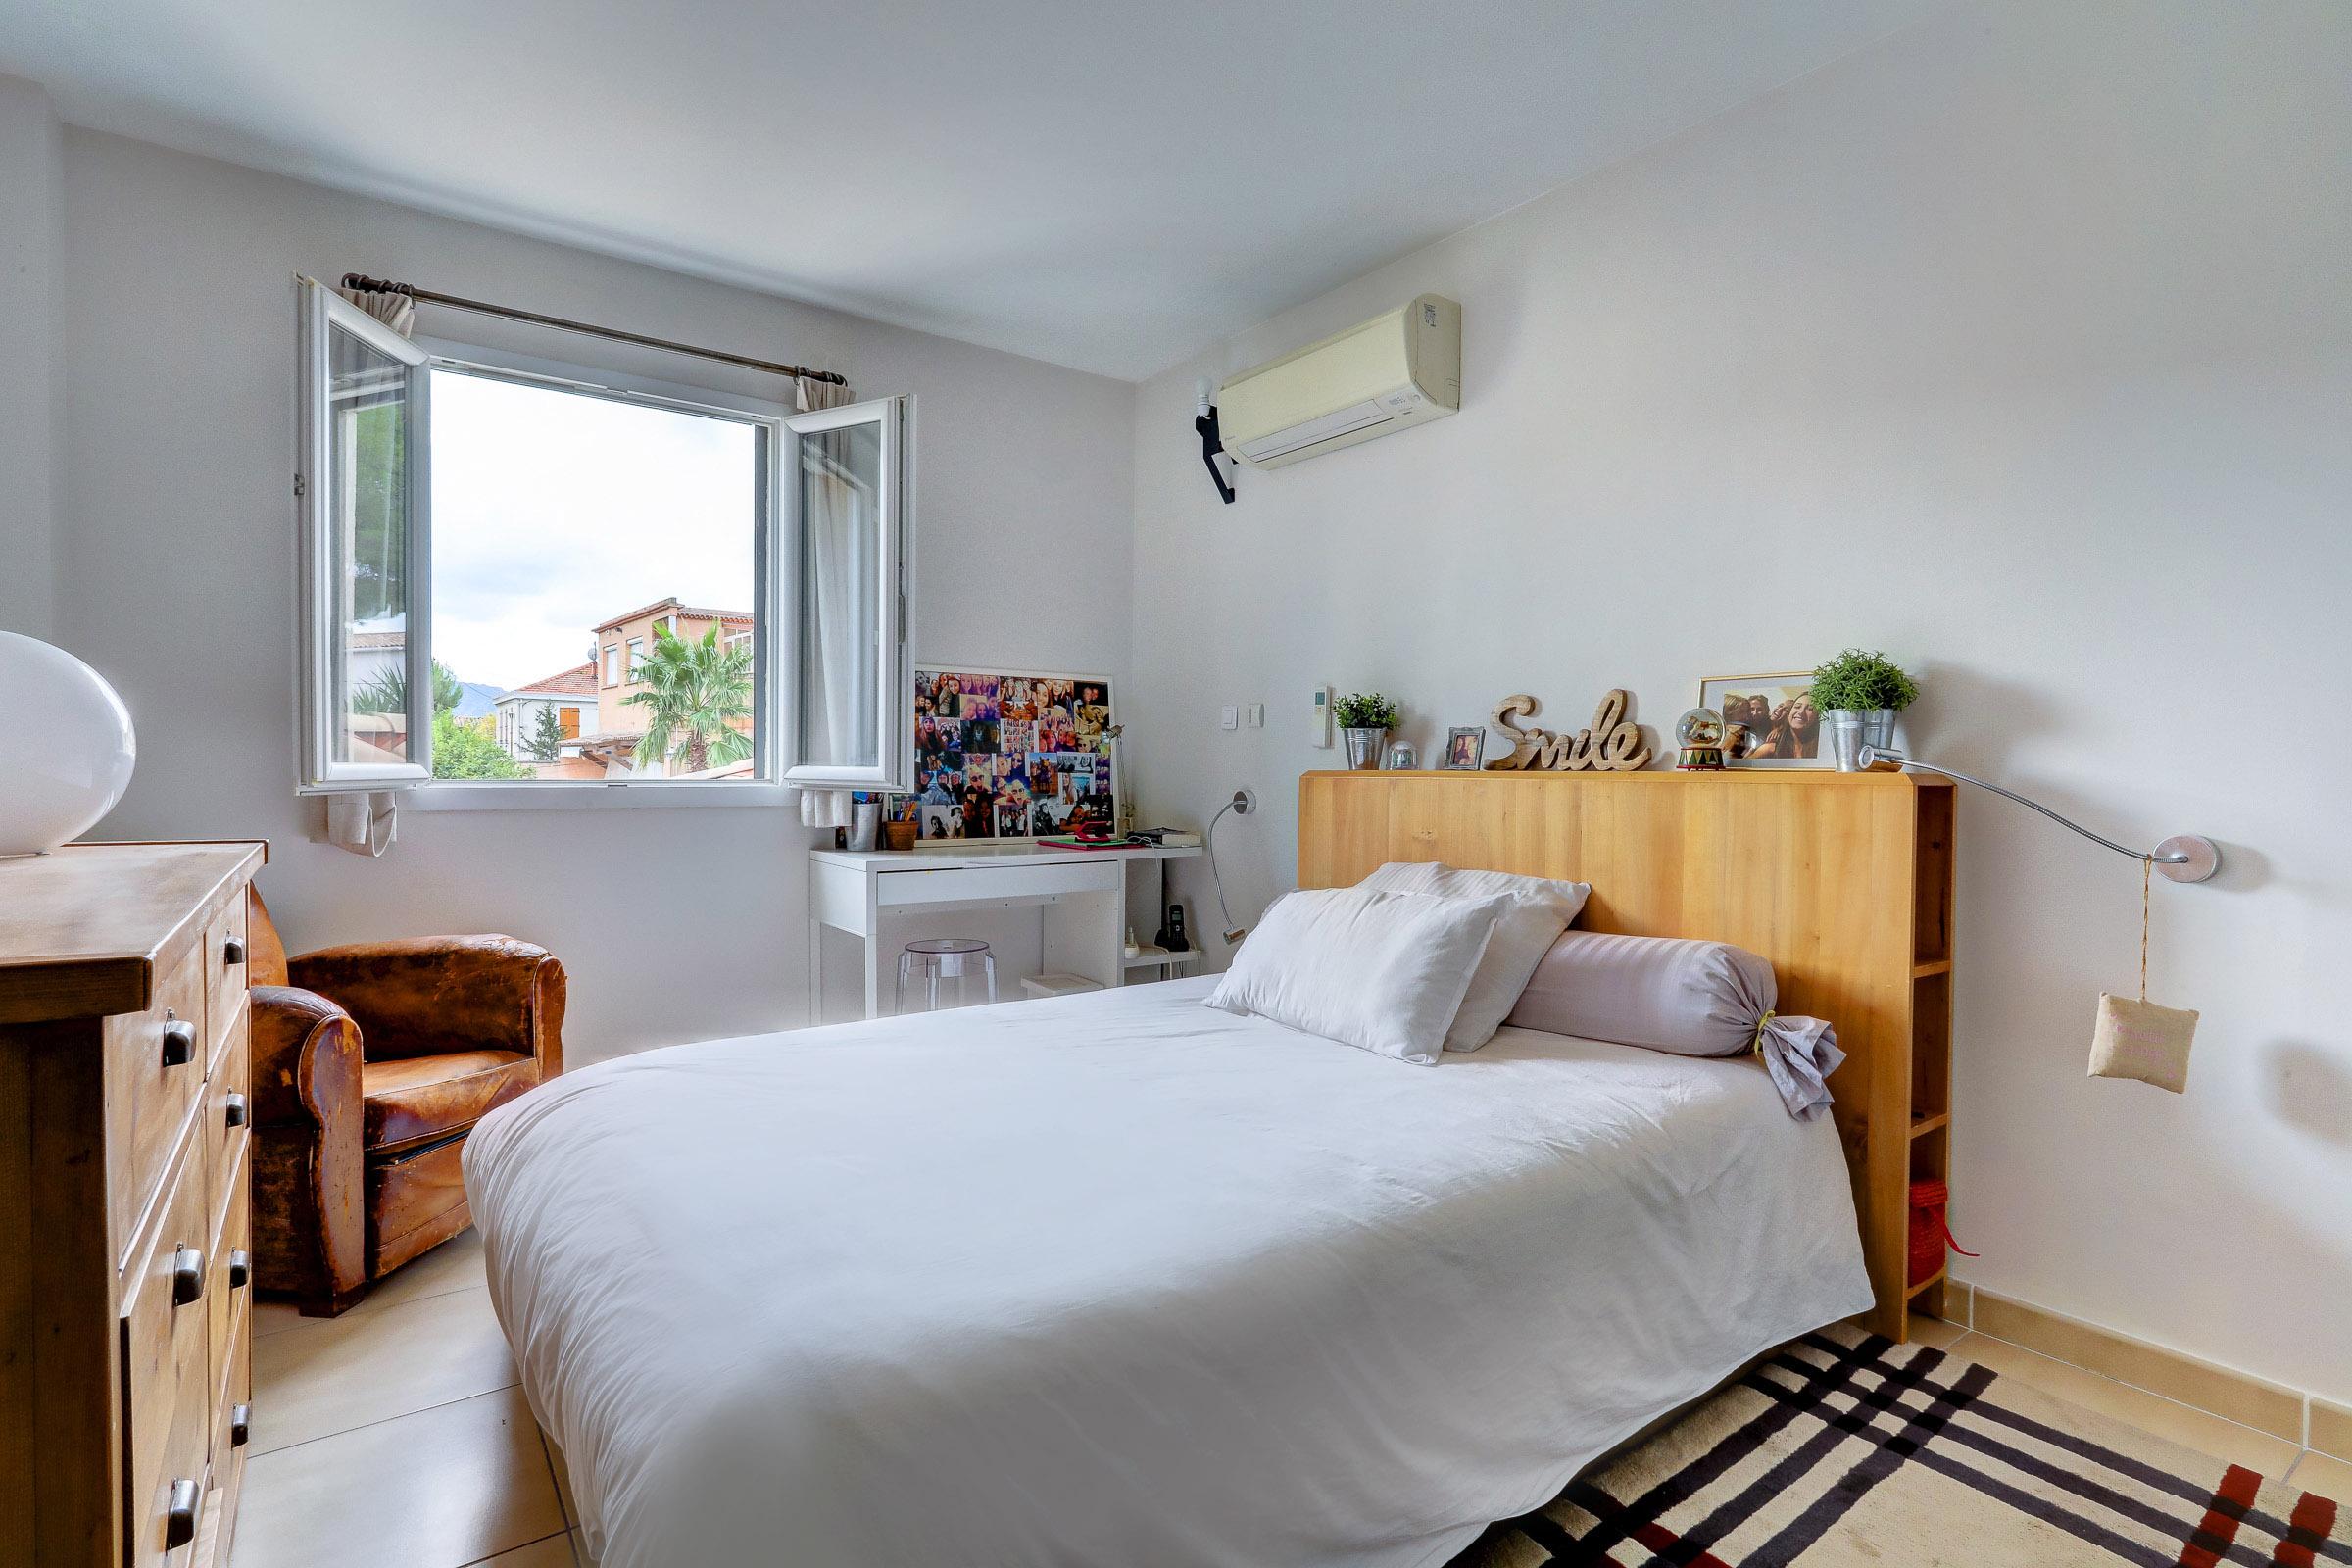 beaumont_13012_villapiscine_teck_contemporaine_terrasse_chambre3_saintjulien_saintbarnabe